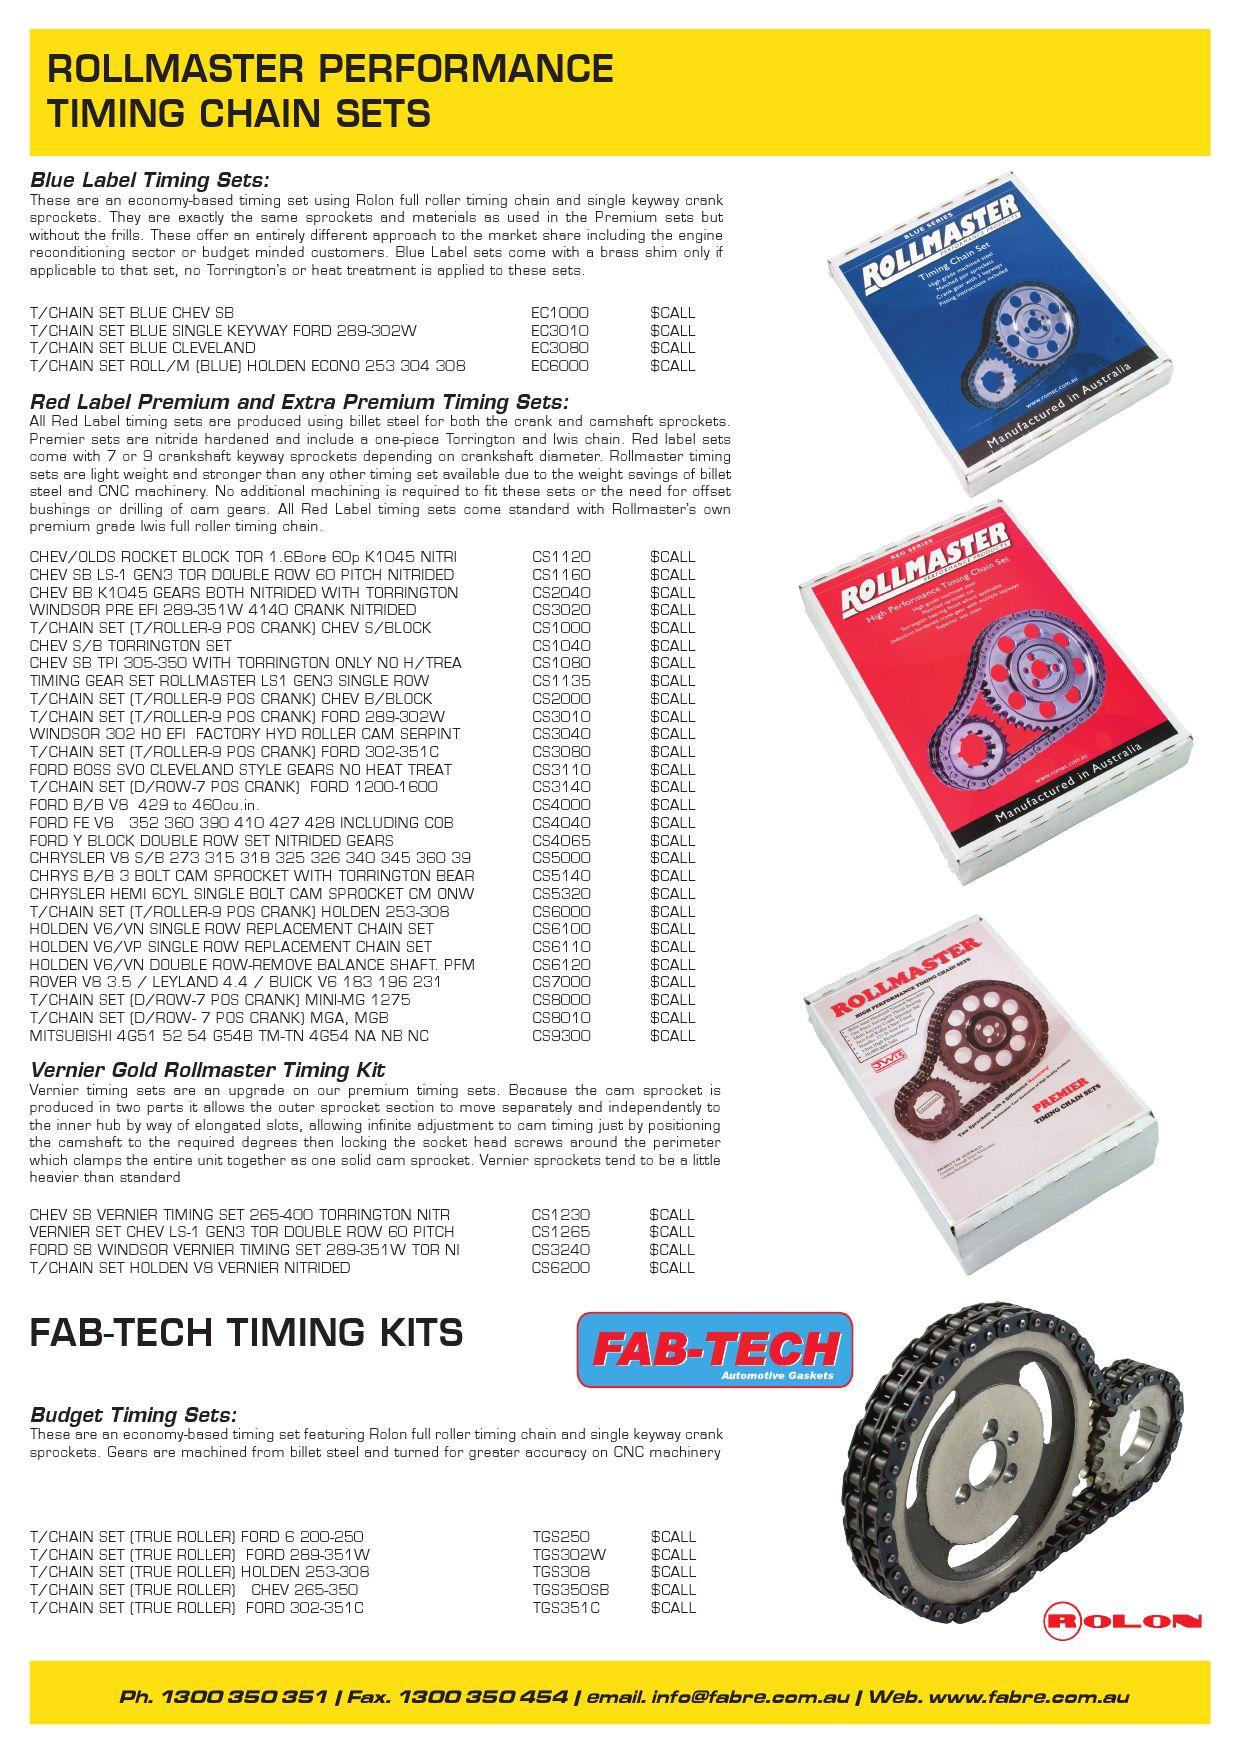 Fabre Newsletter September 2009 by Fabre Australia - issuu